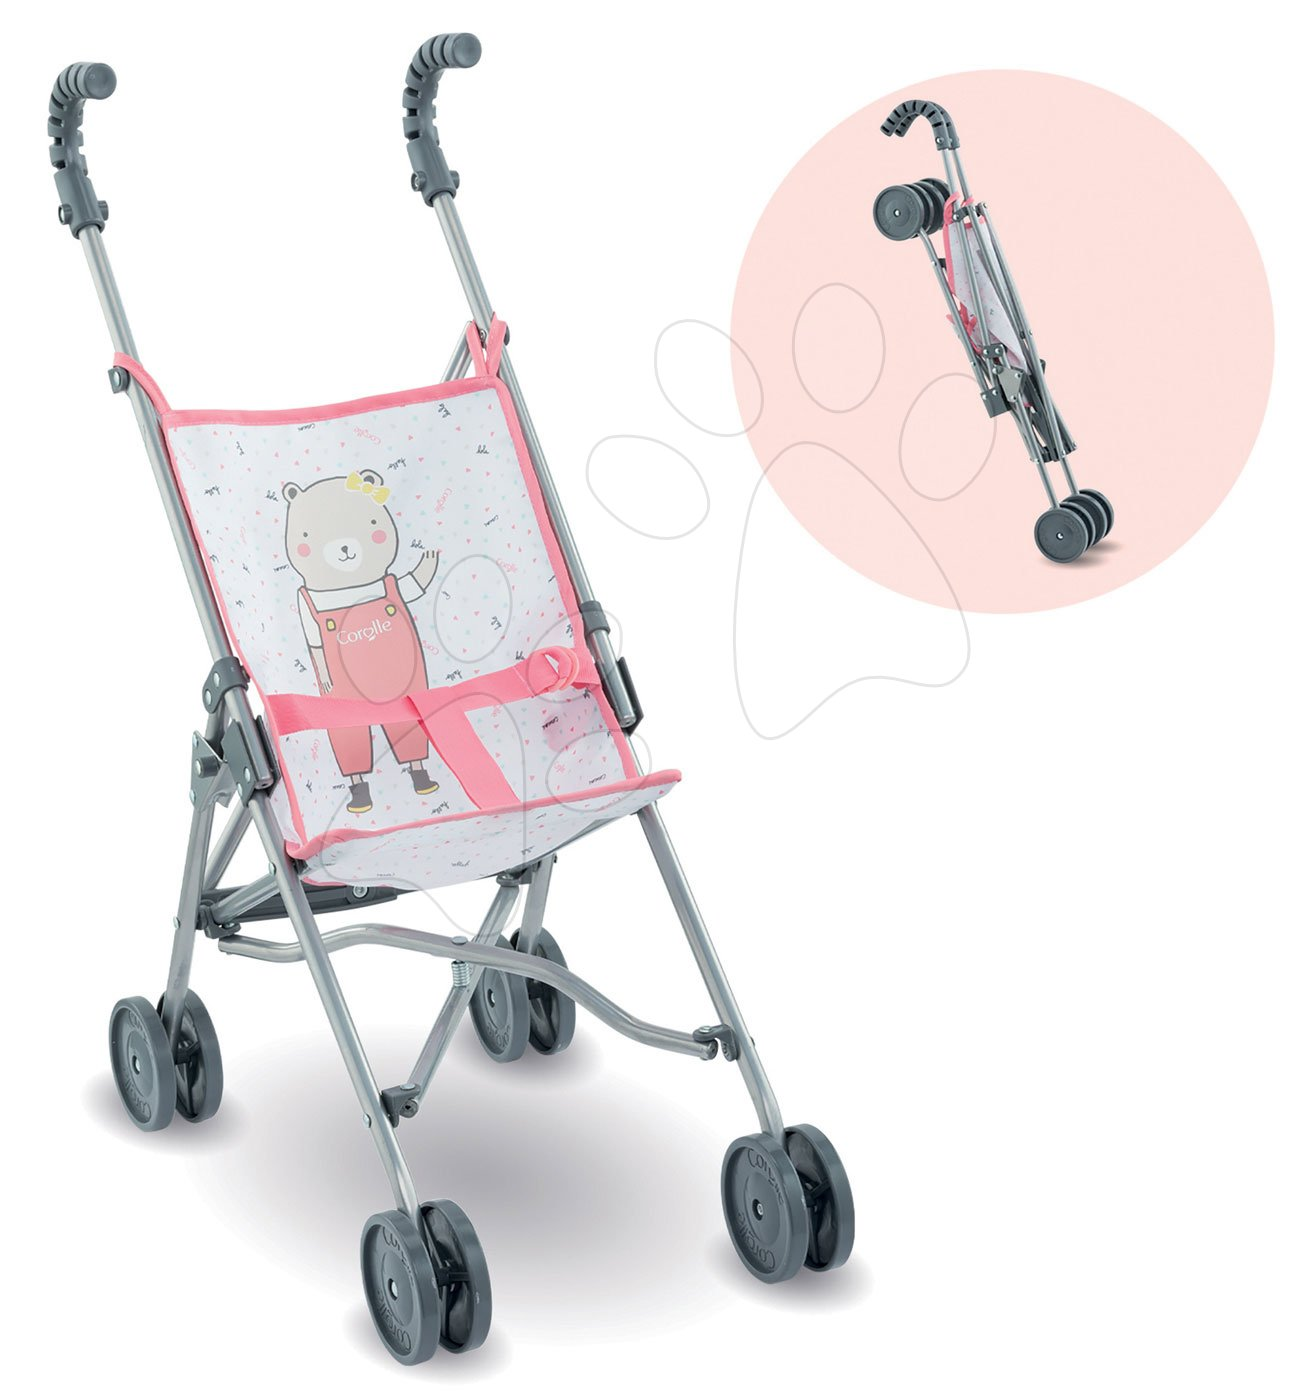 Kočík skladací Umbrella Stroller Mon Grand Poupon Corolle Canne Pink pre 36-42 cm bábiku od 24 mes